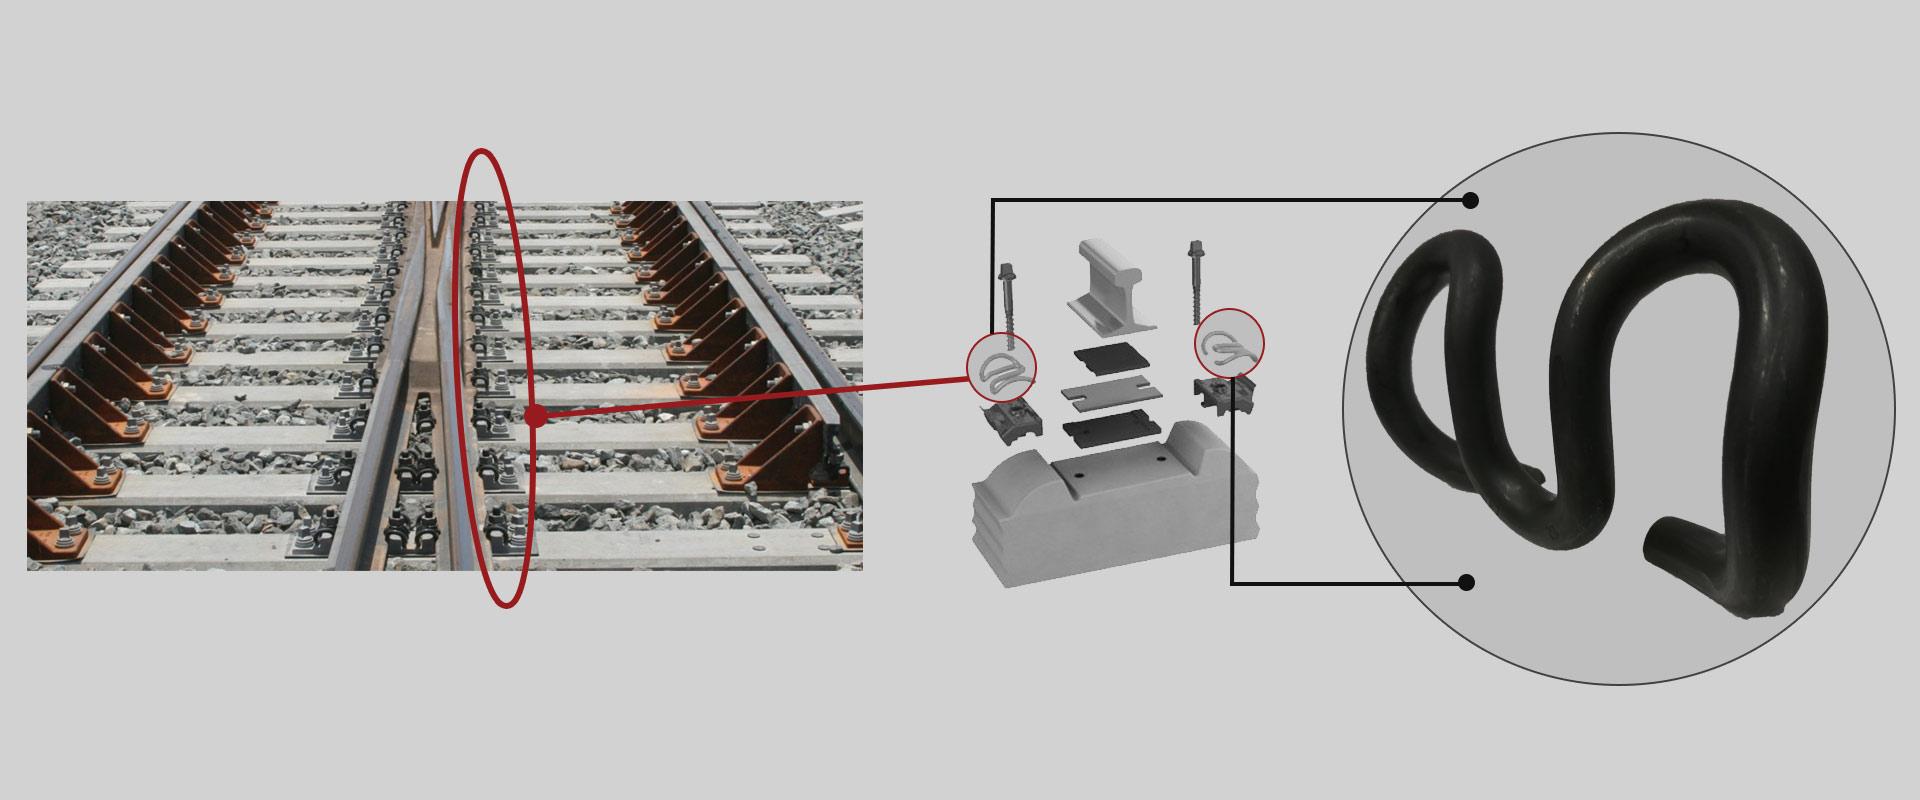 talasli-imalat-urunler-022